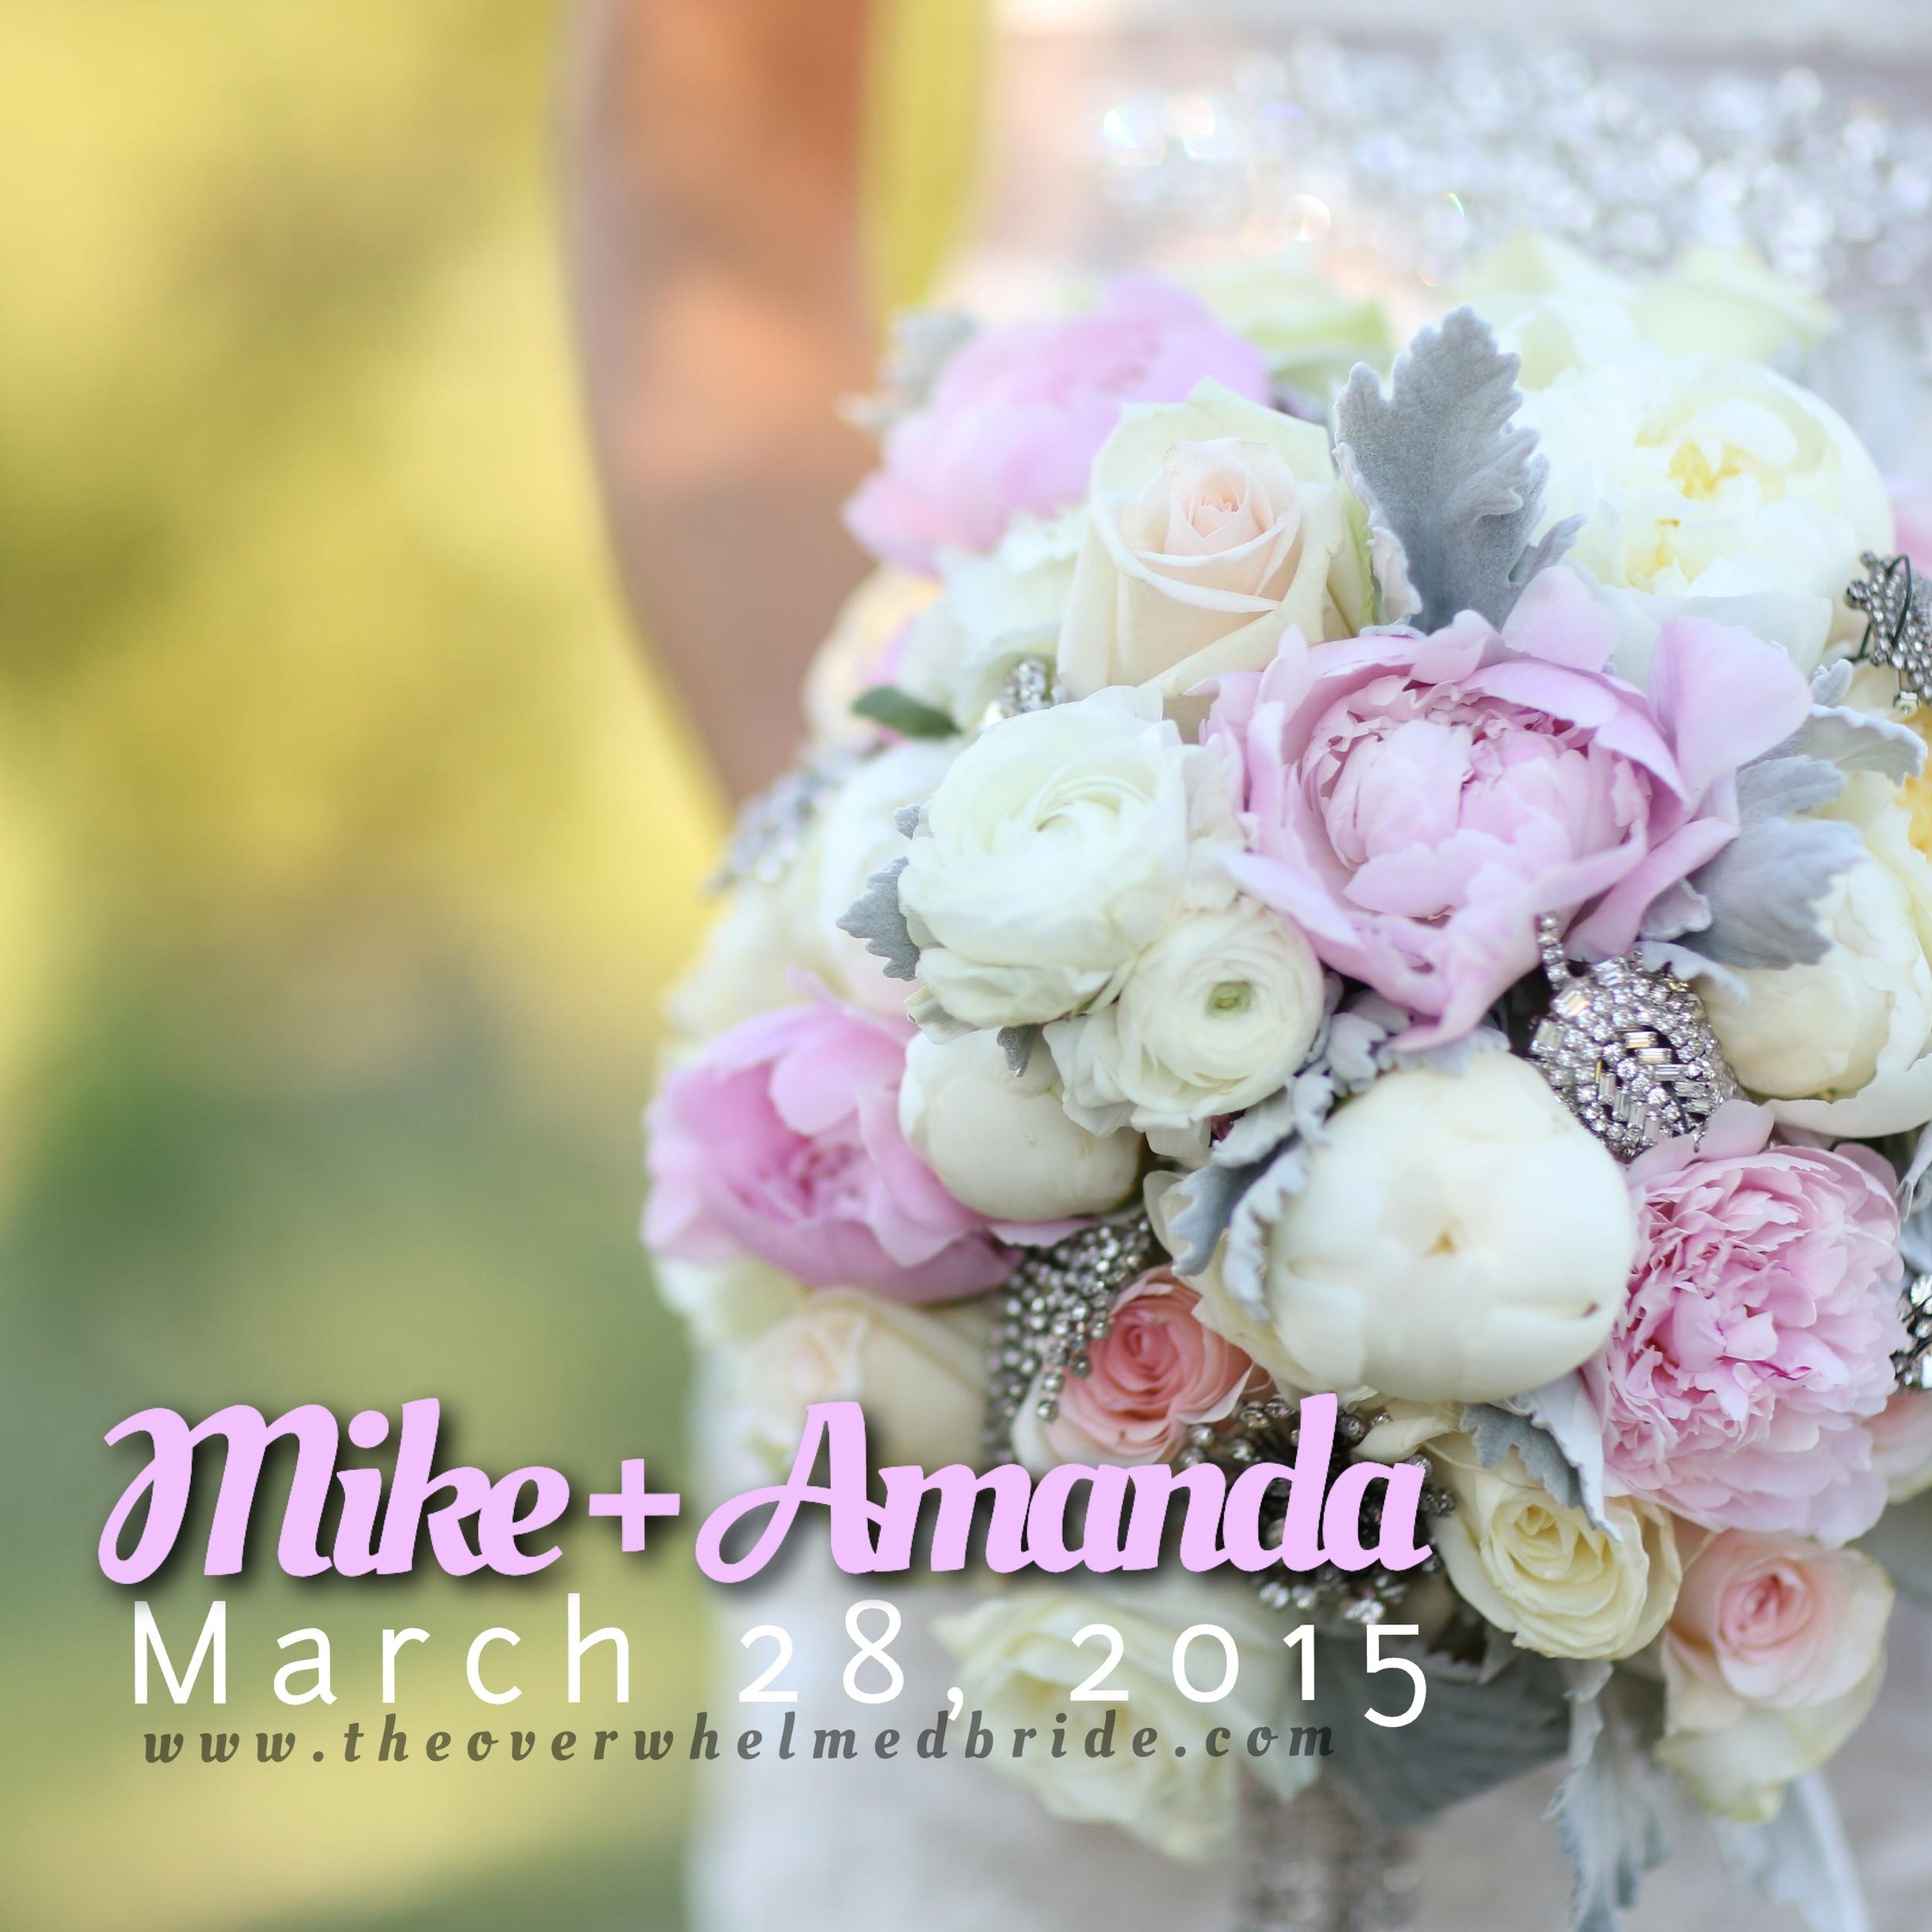 los angeles ranch wedding venue // southern california wedding planner // the overwhelmed bride wedding blog